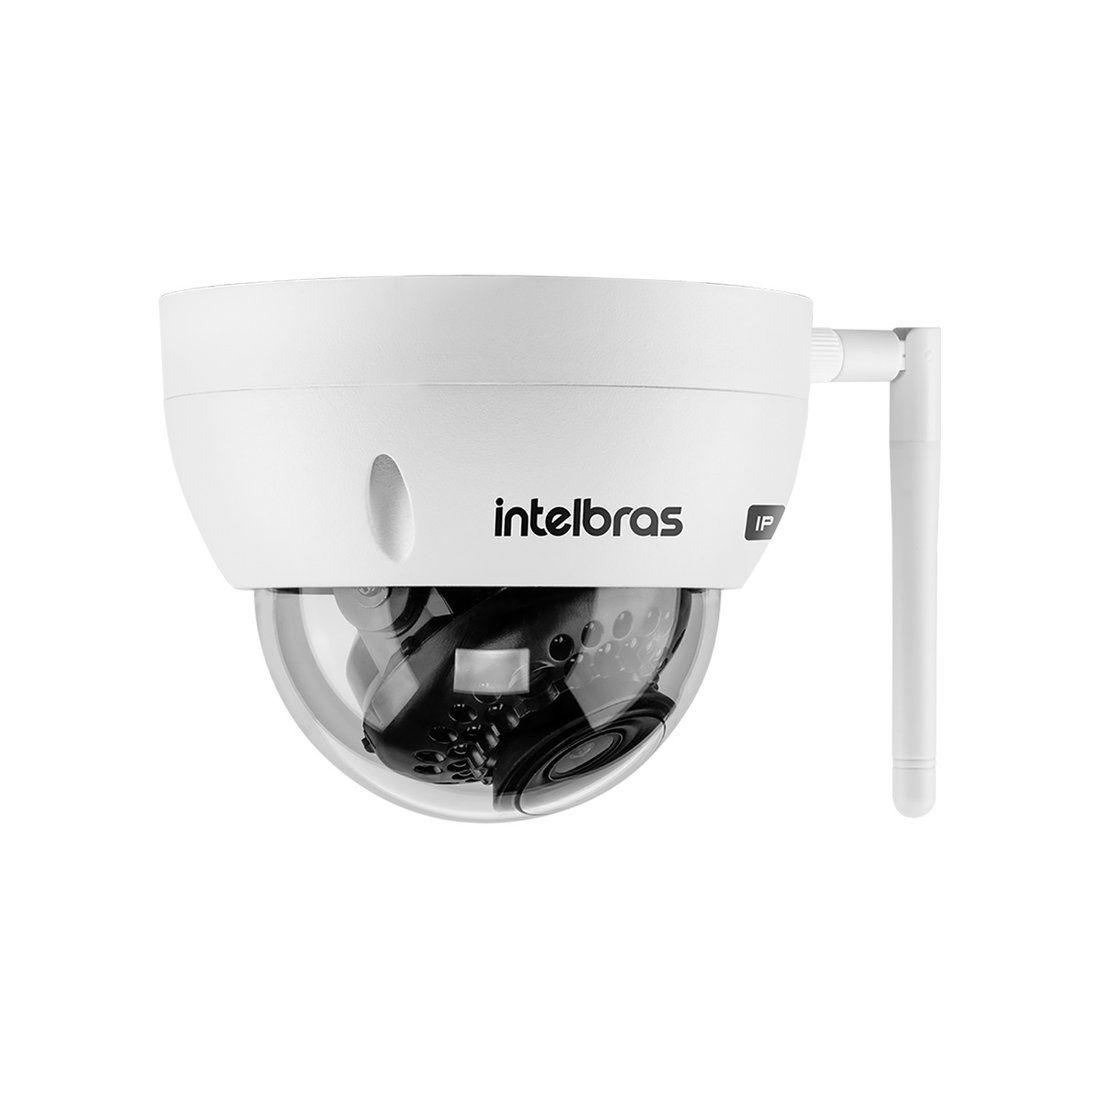 Câmera IP Wi-Fi Intelbras VIP 3430 D W 4 Megapixel 30 Metros